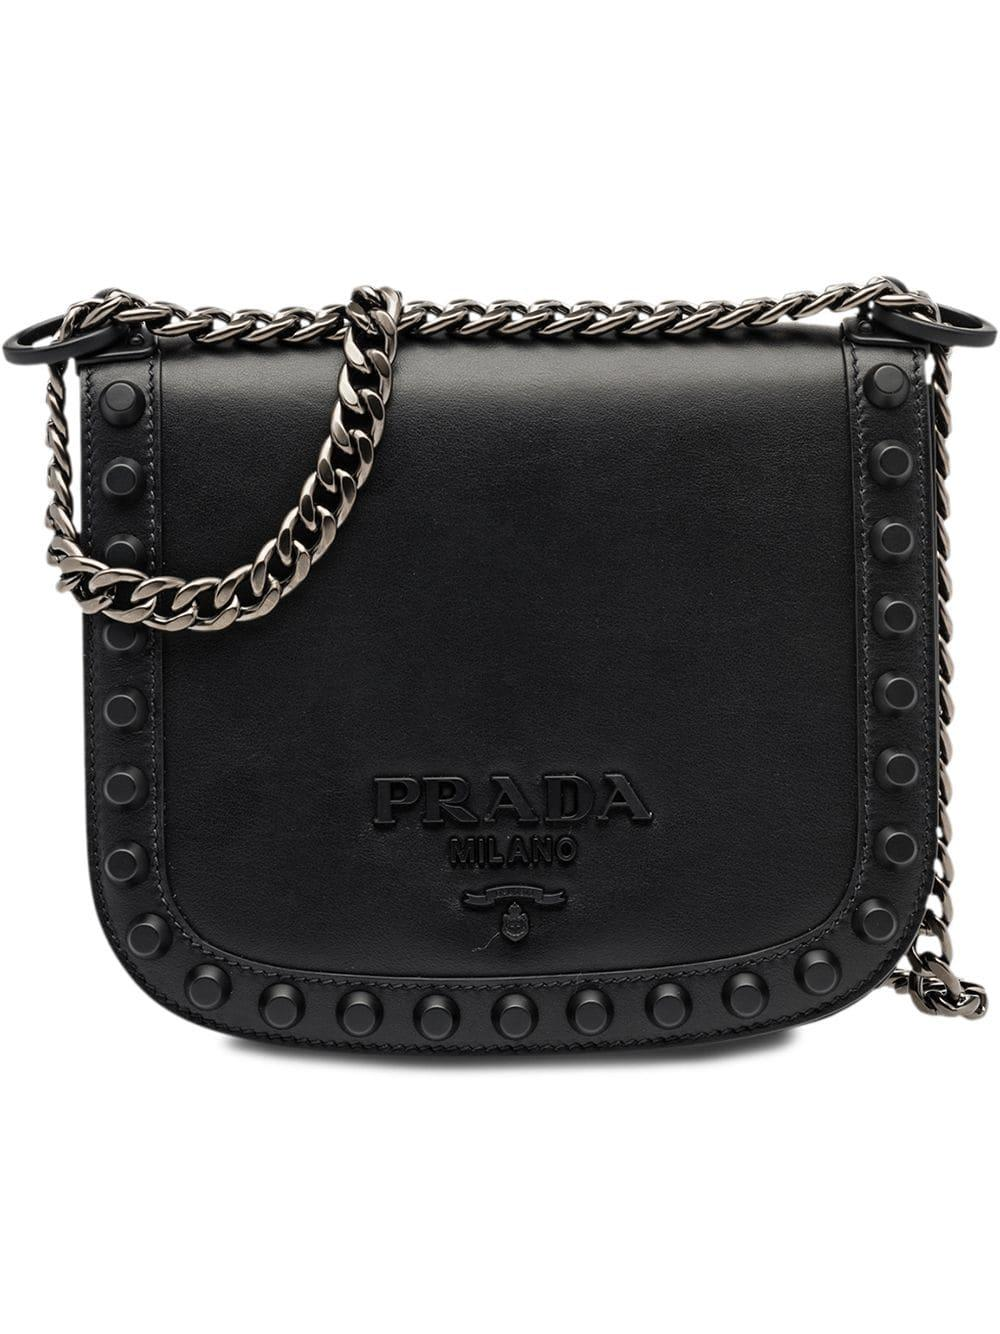 dc6b3b9b02377b Prada PionnièRe Studded Shoulder Bag - Black | ModeSens